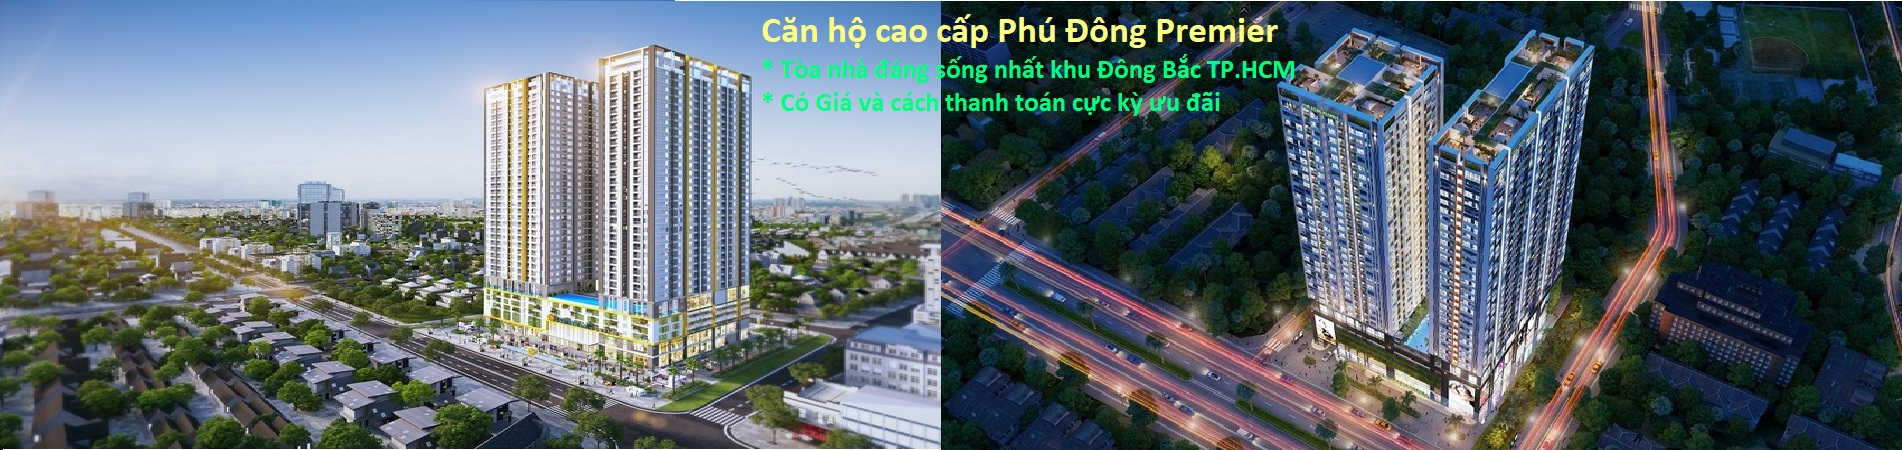 Phu dong Premier expresslandcomvn